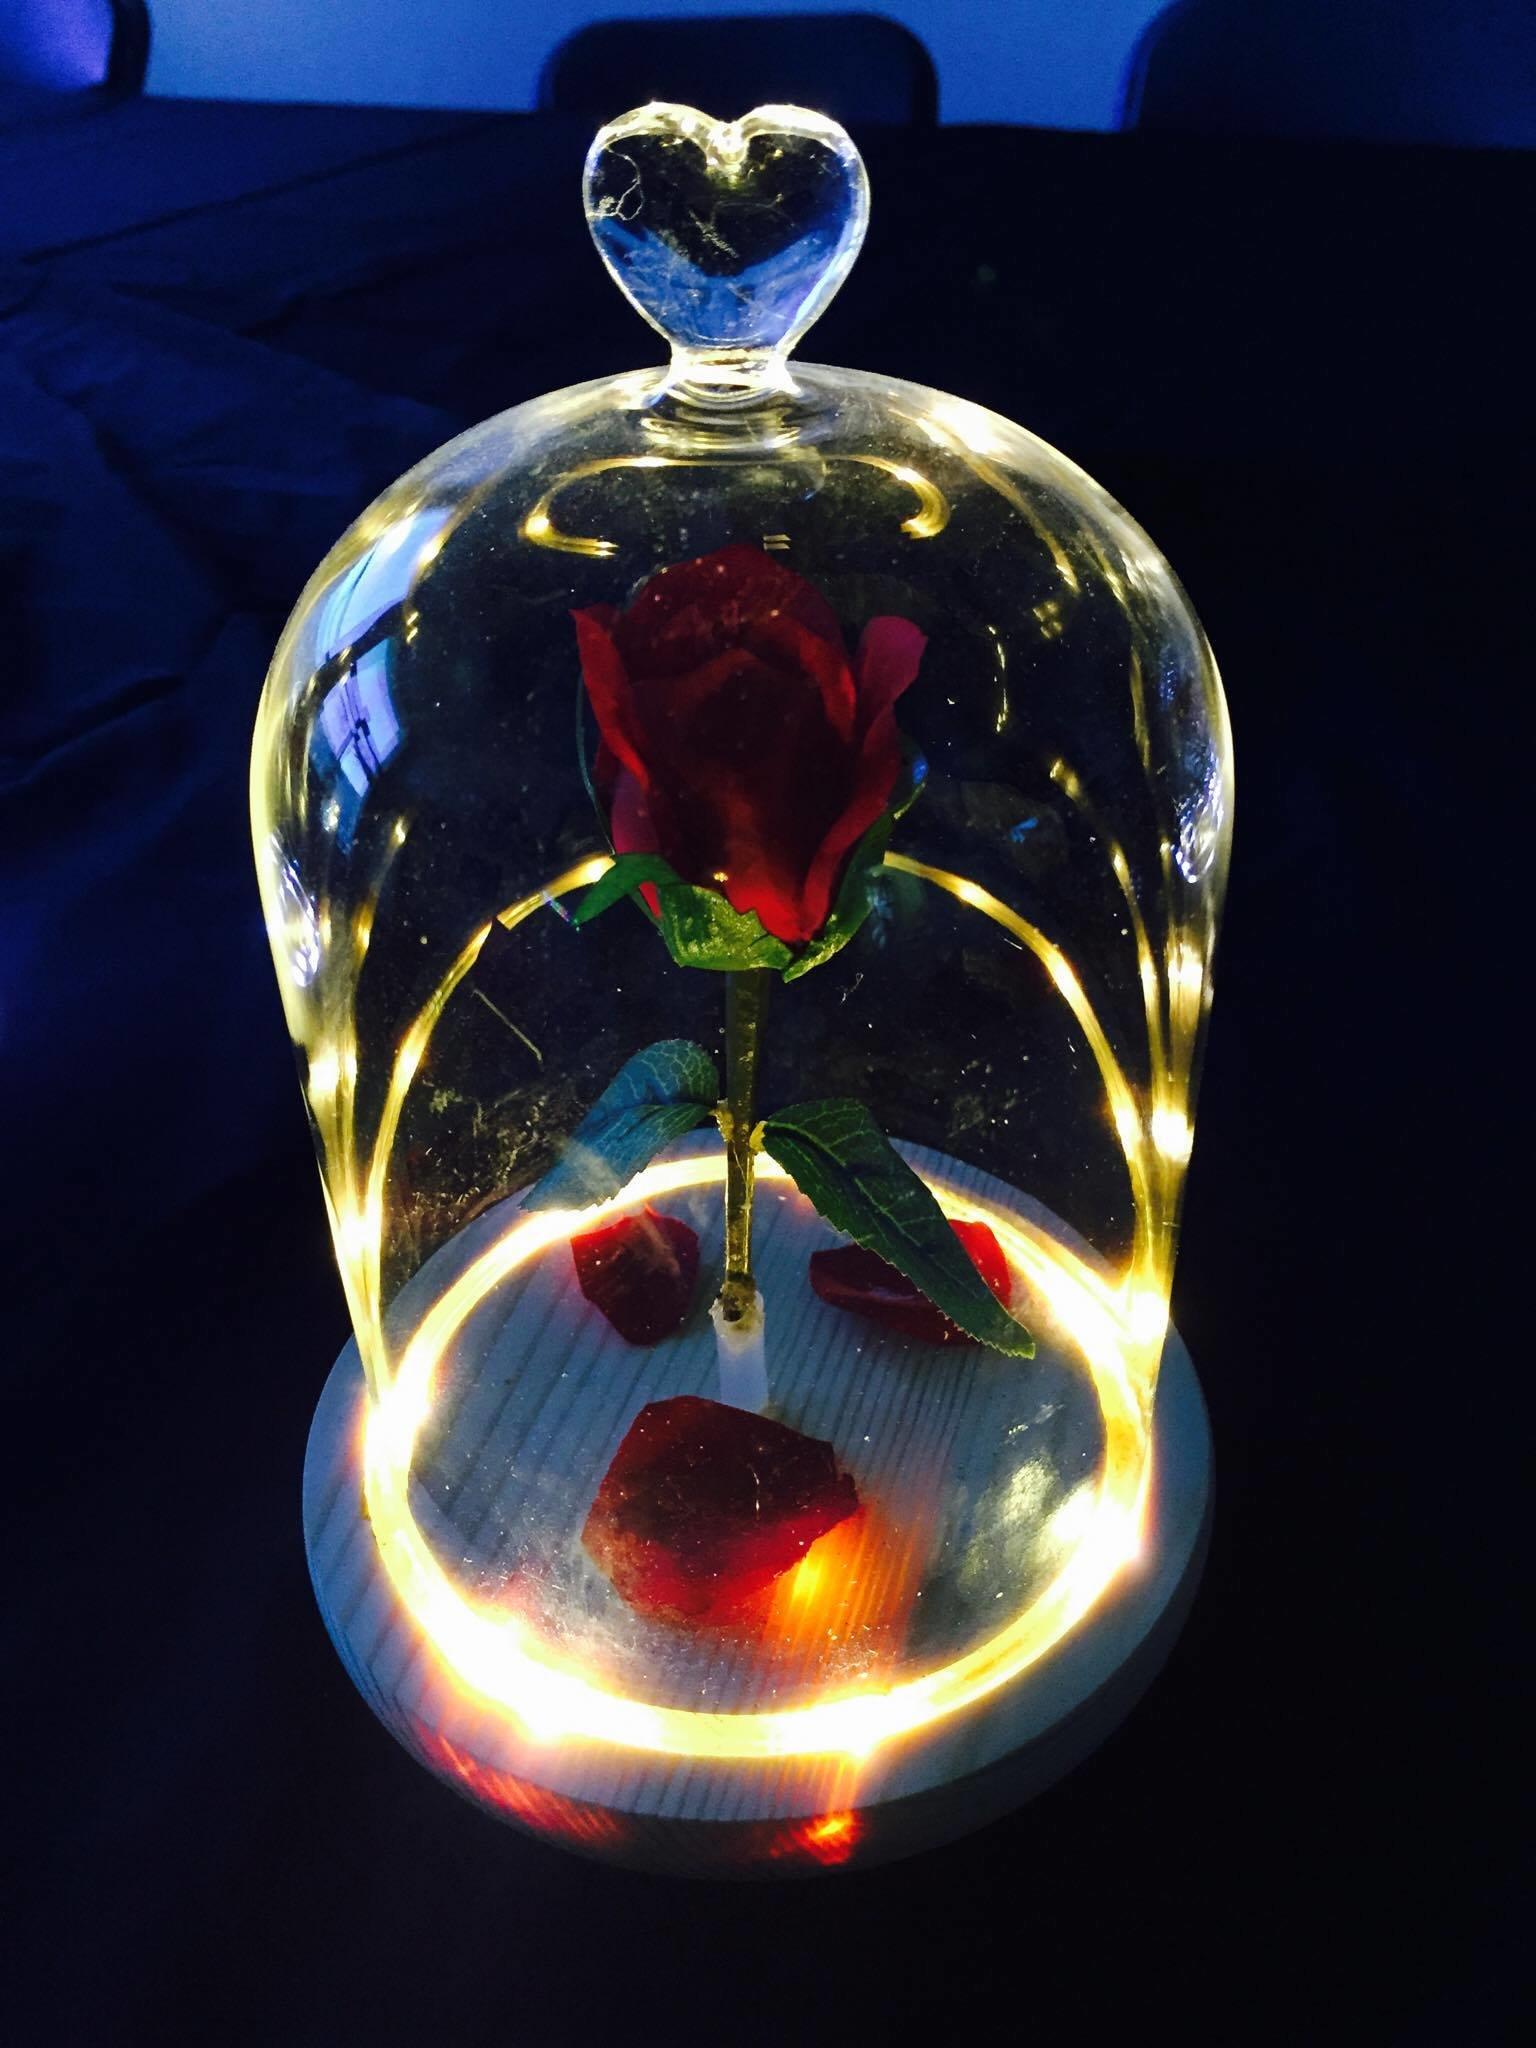 Beauty And The Beast Flower Rose Princess Prince Fairy